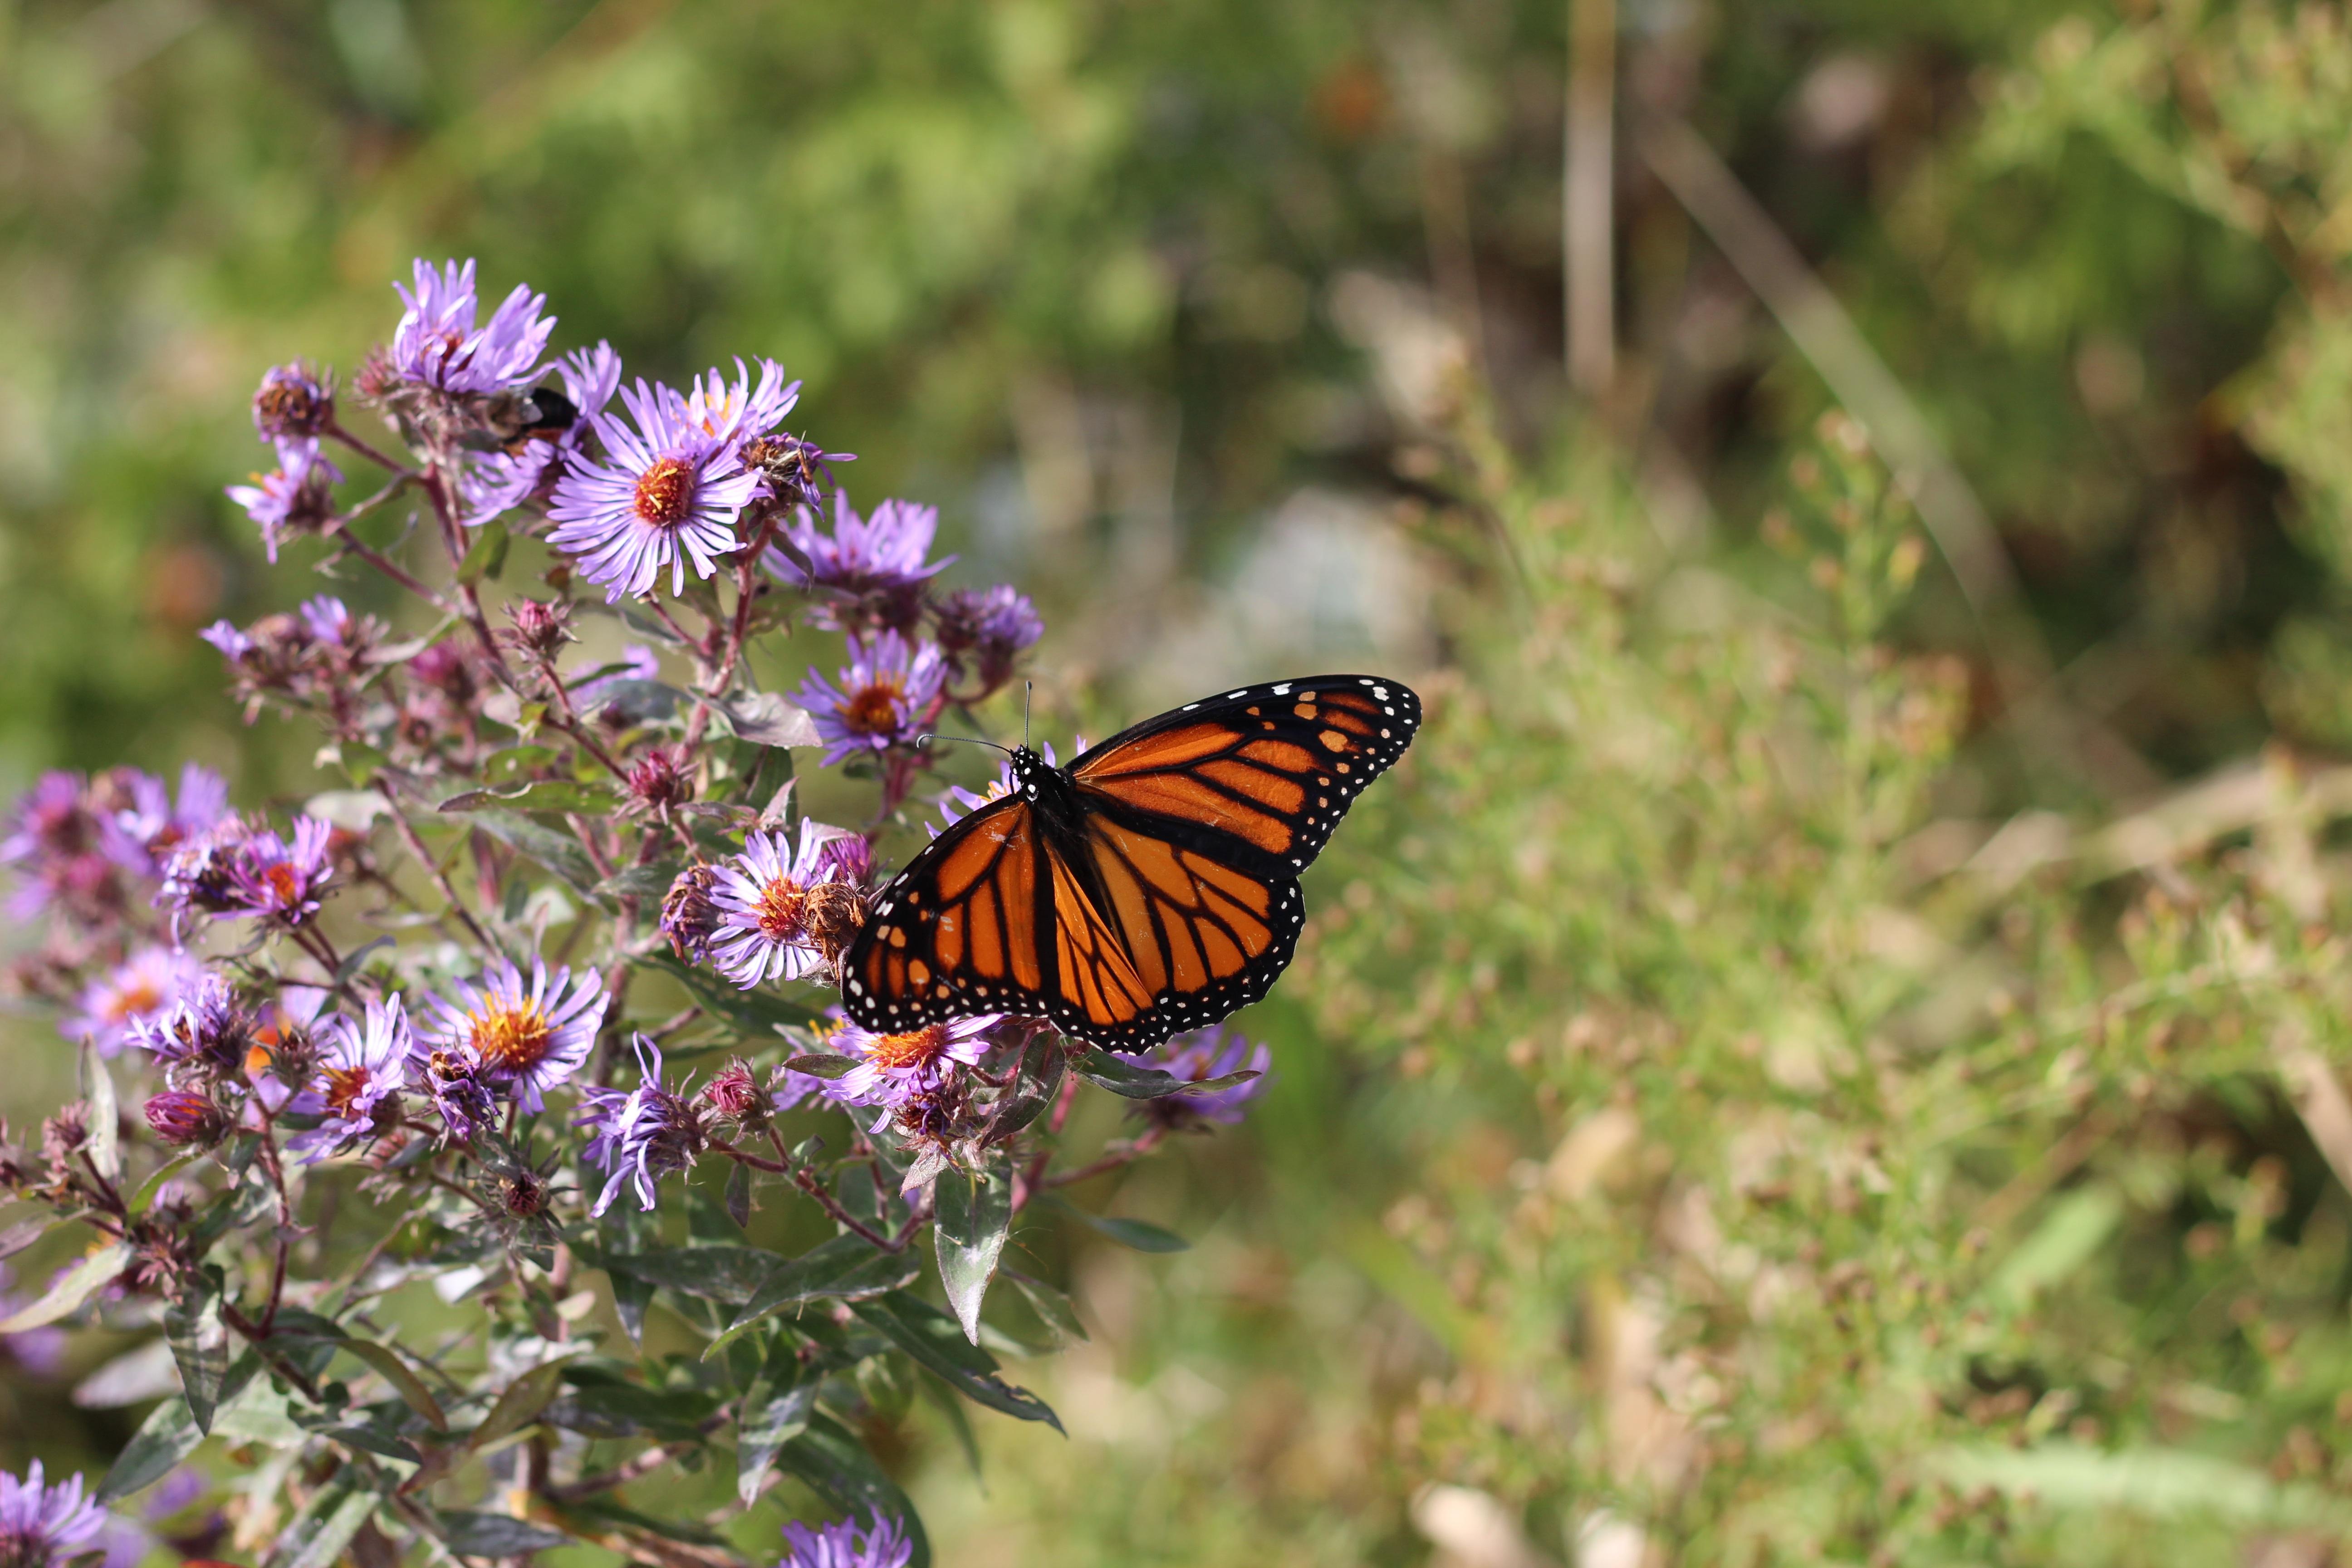 Free Images  nature, flower, wildlife, insect, botany